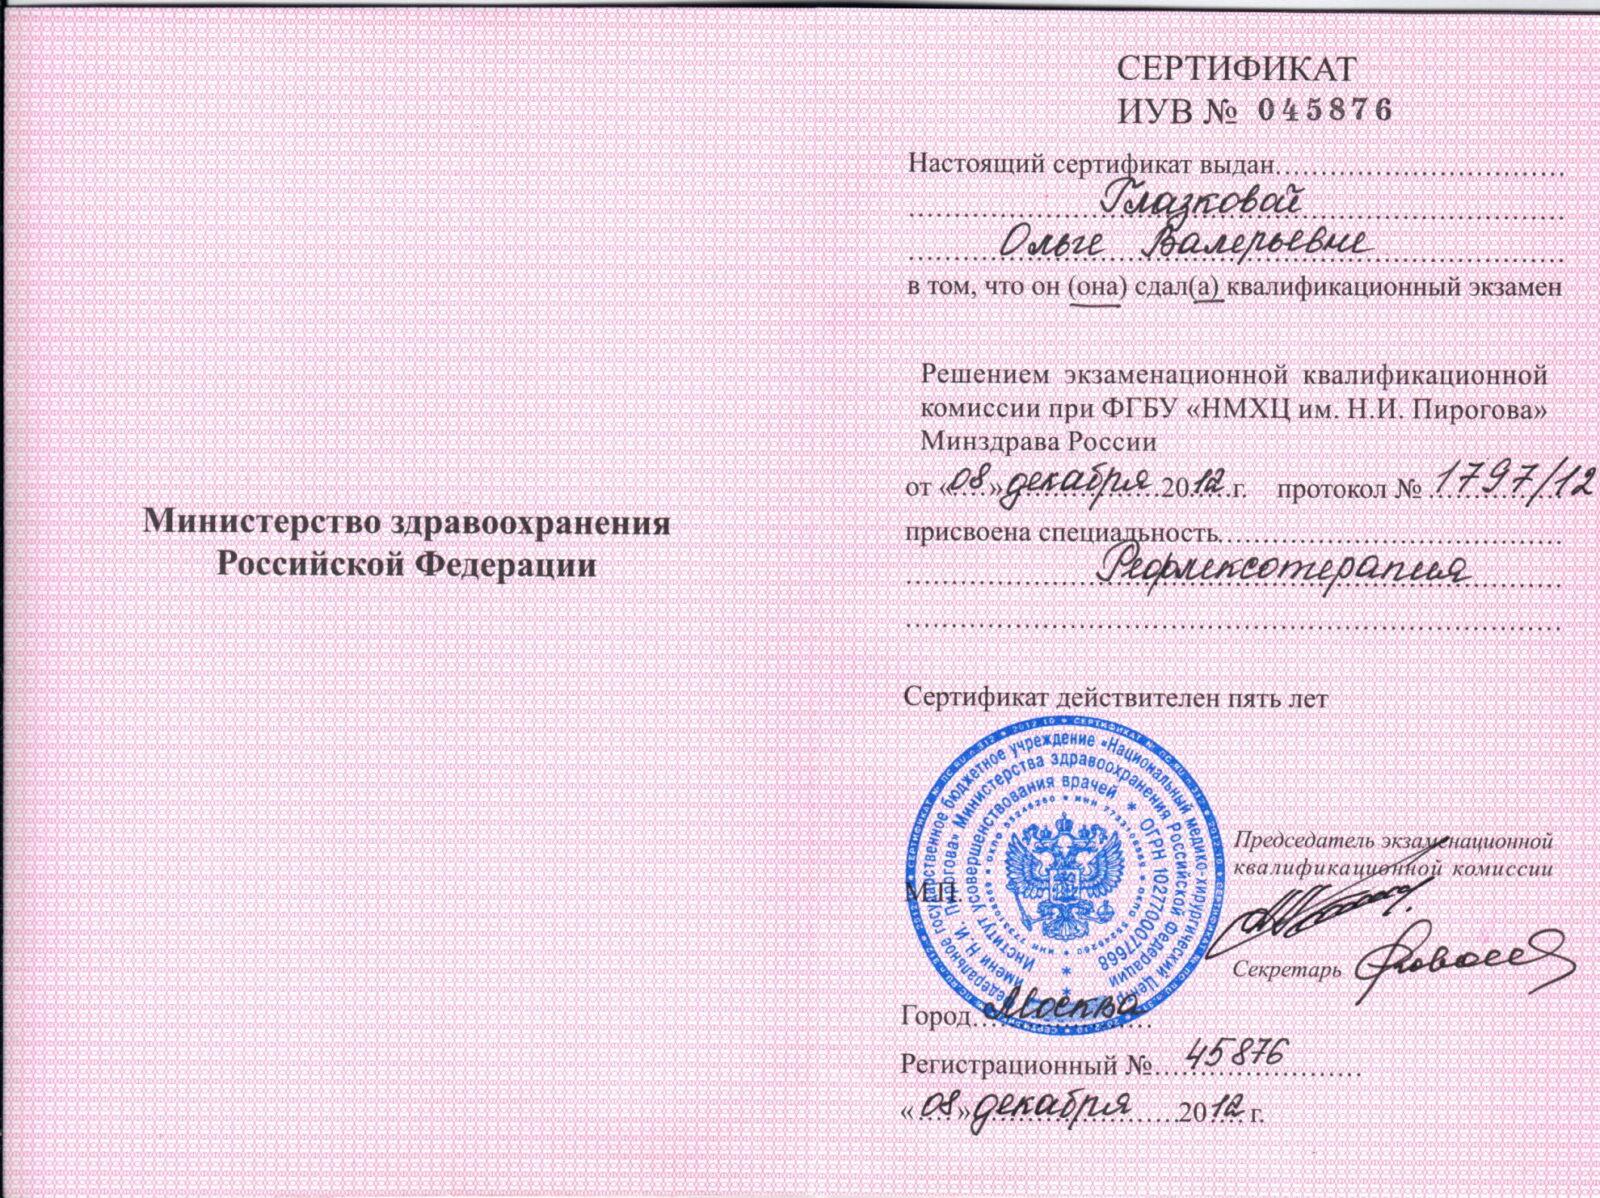 2012.12.08 Сертификат